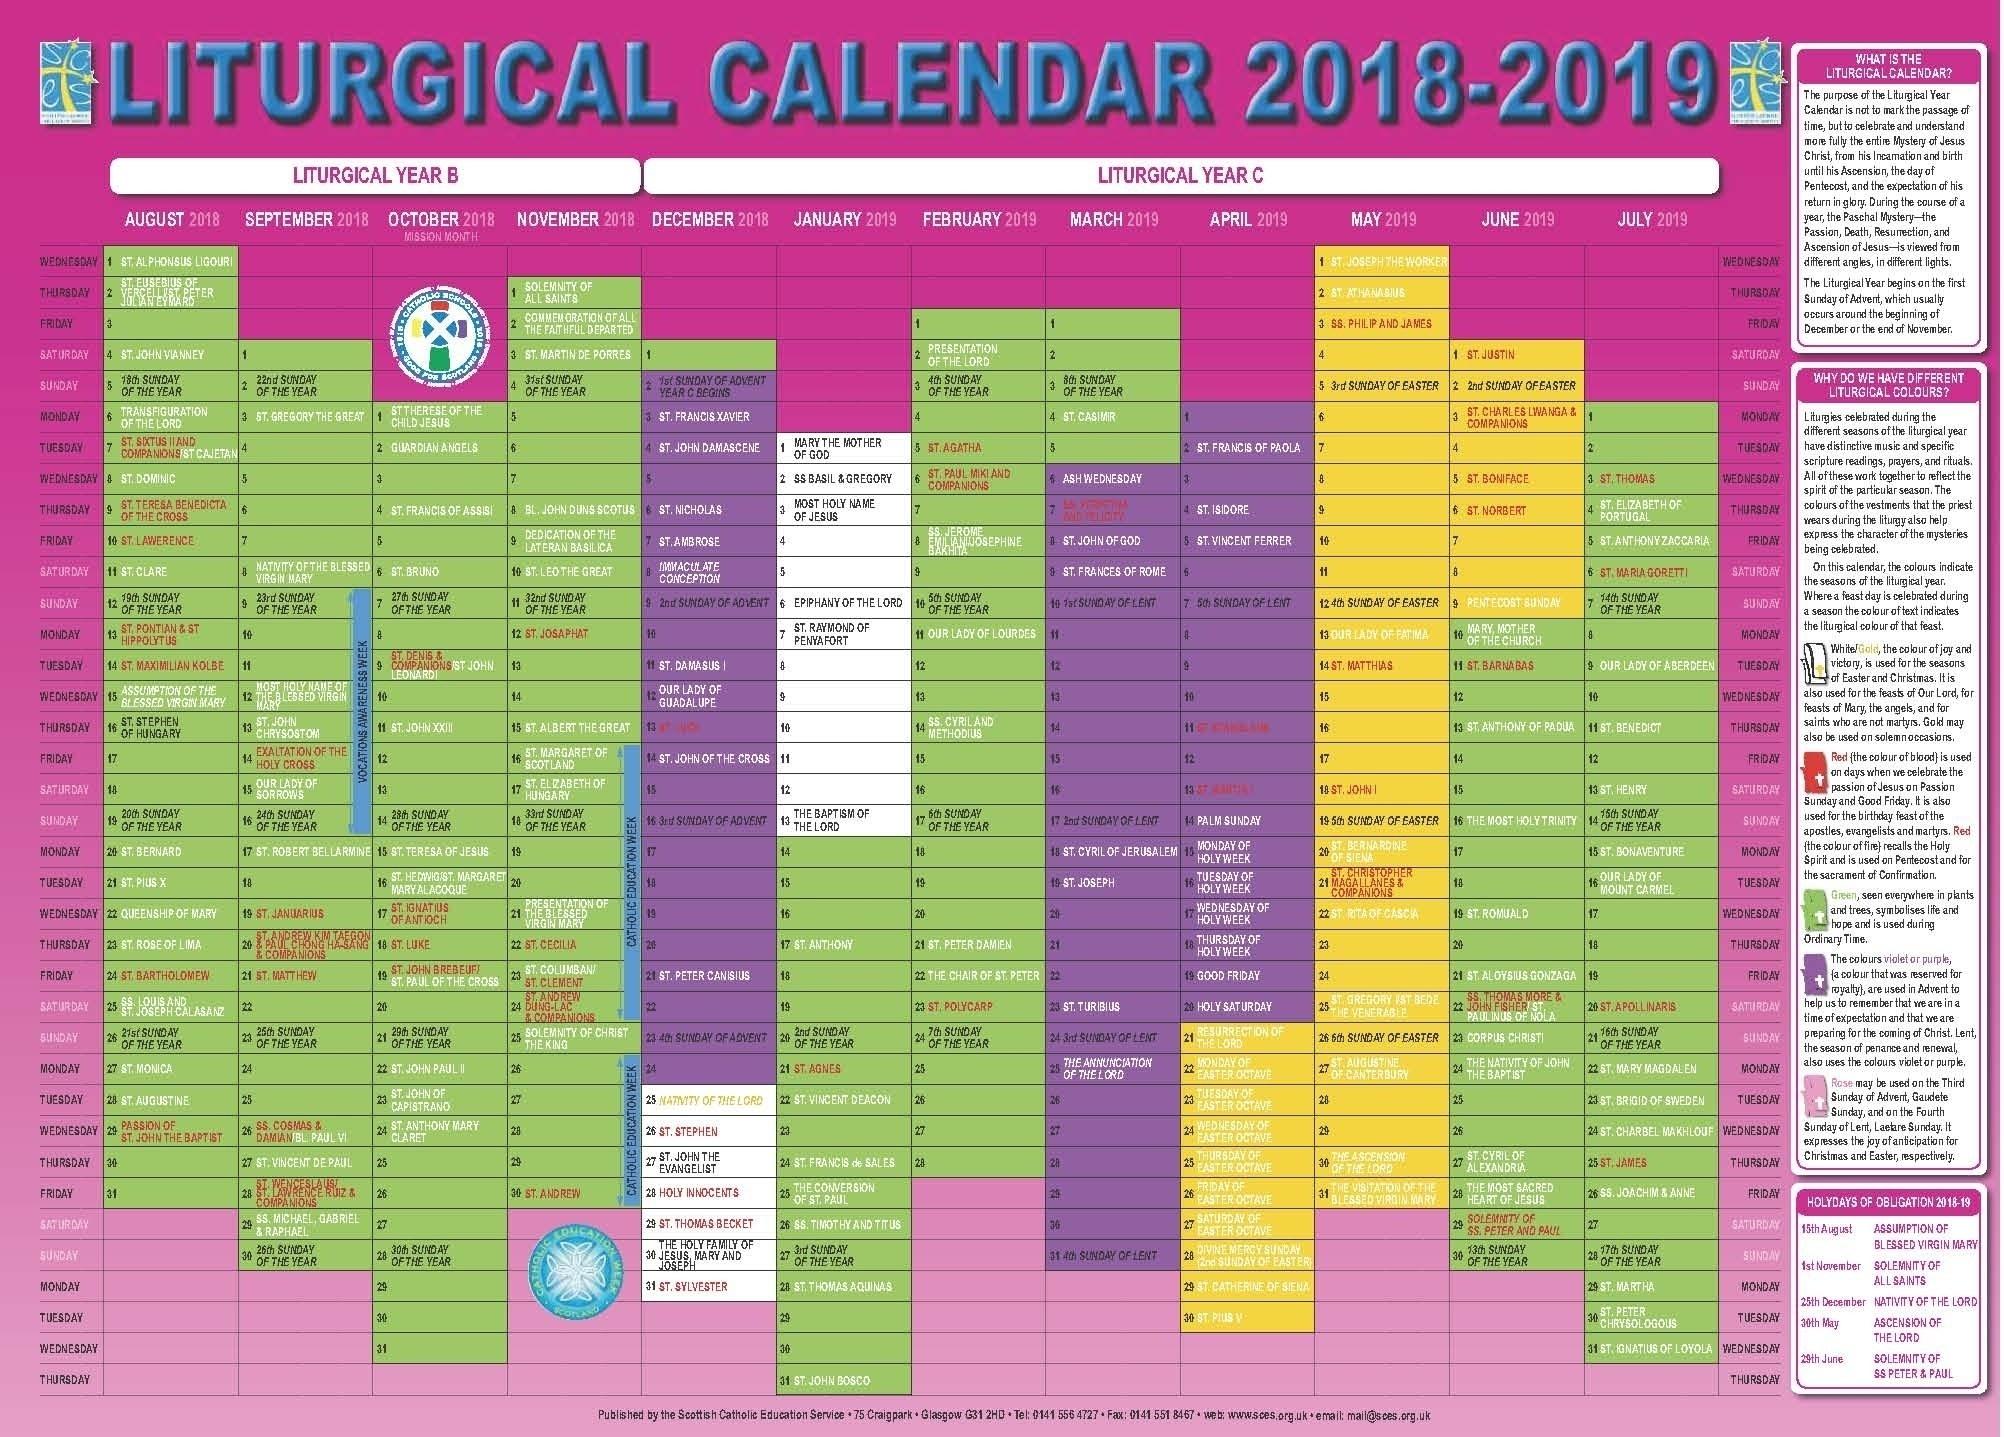 Liturgical Church Calendar Worksheet | Printable Worksheets inside Printable Catholic Liturgical Calendar 2019 2020